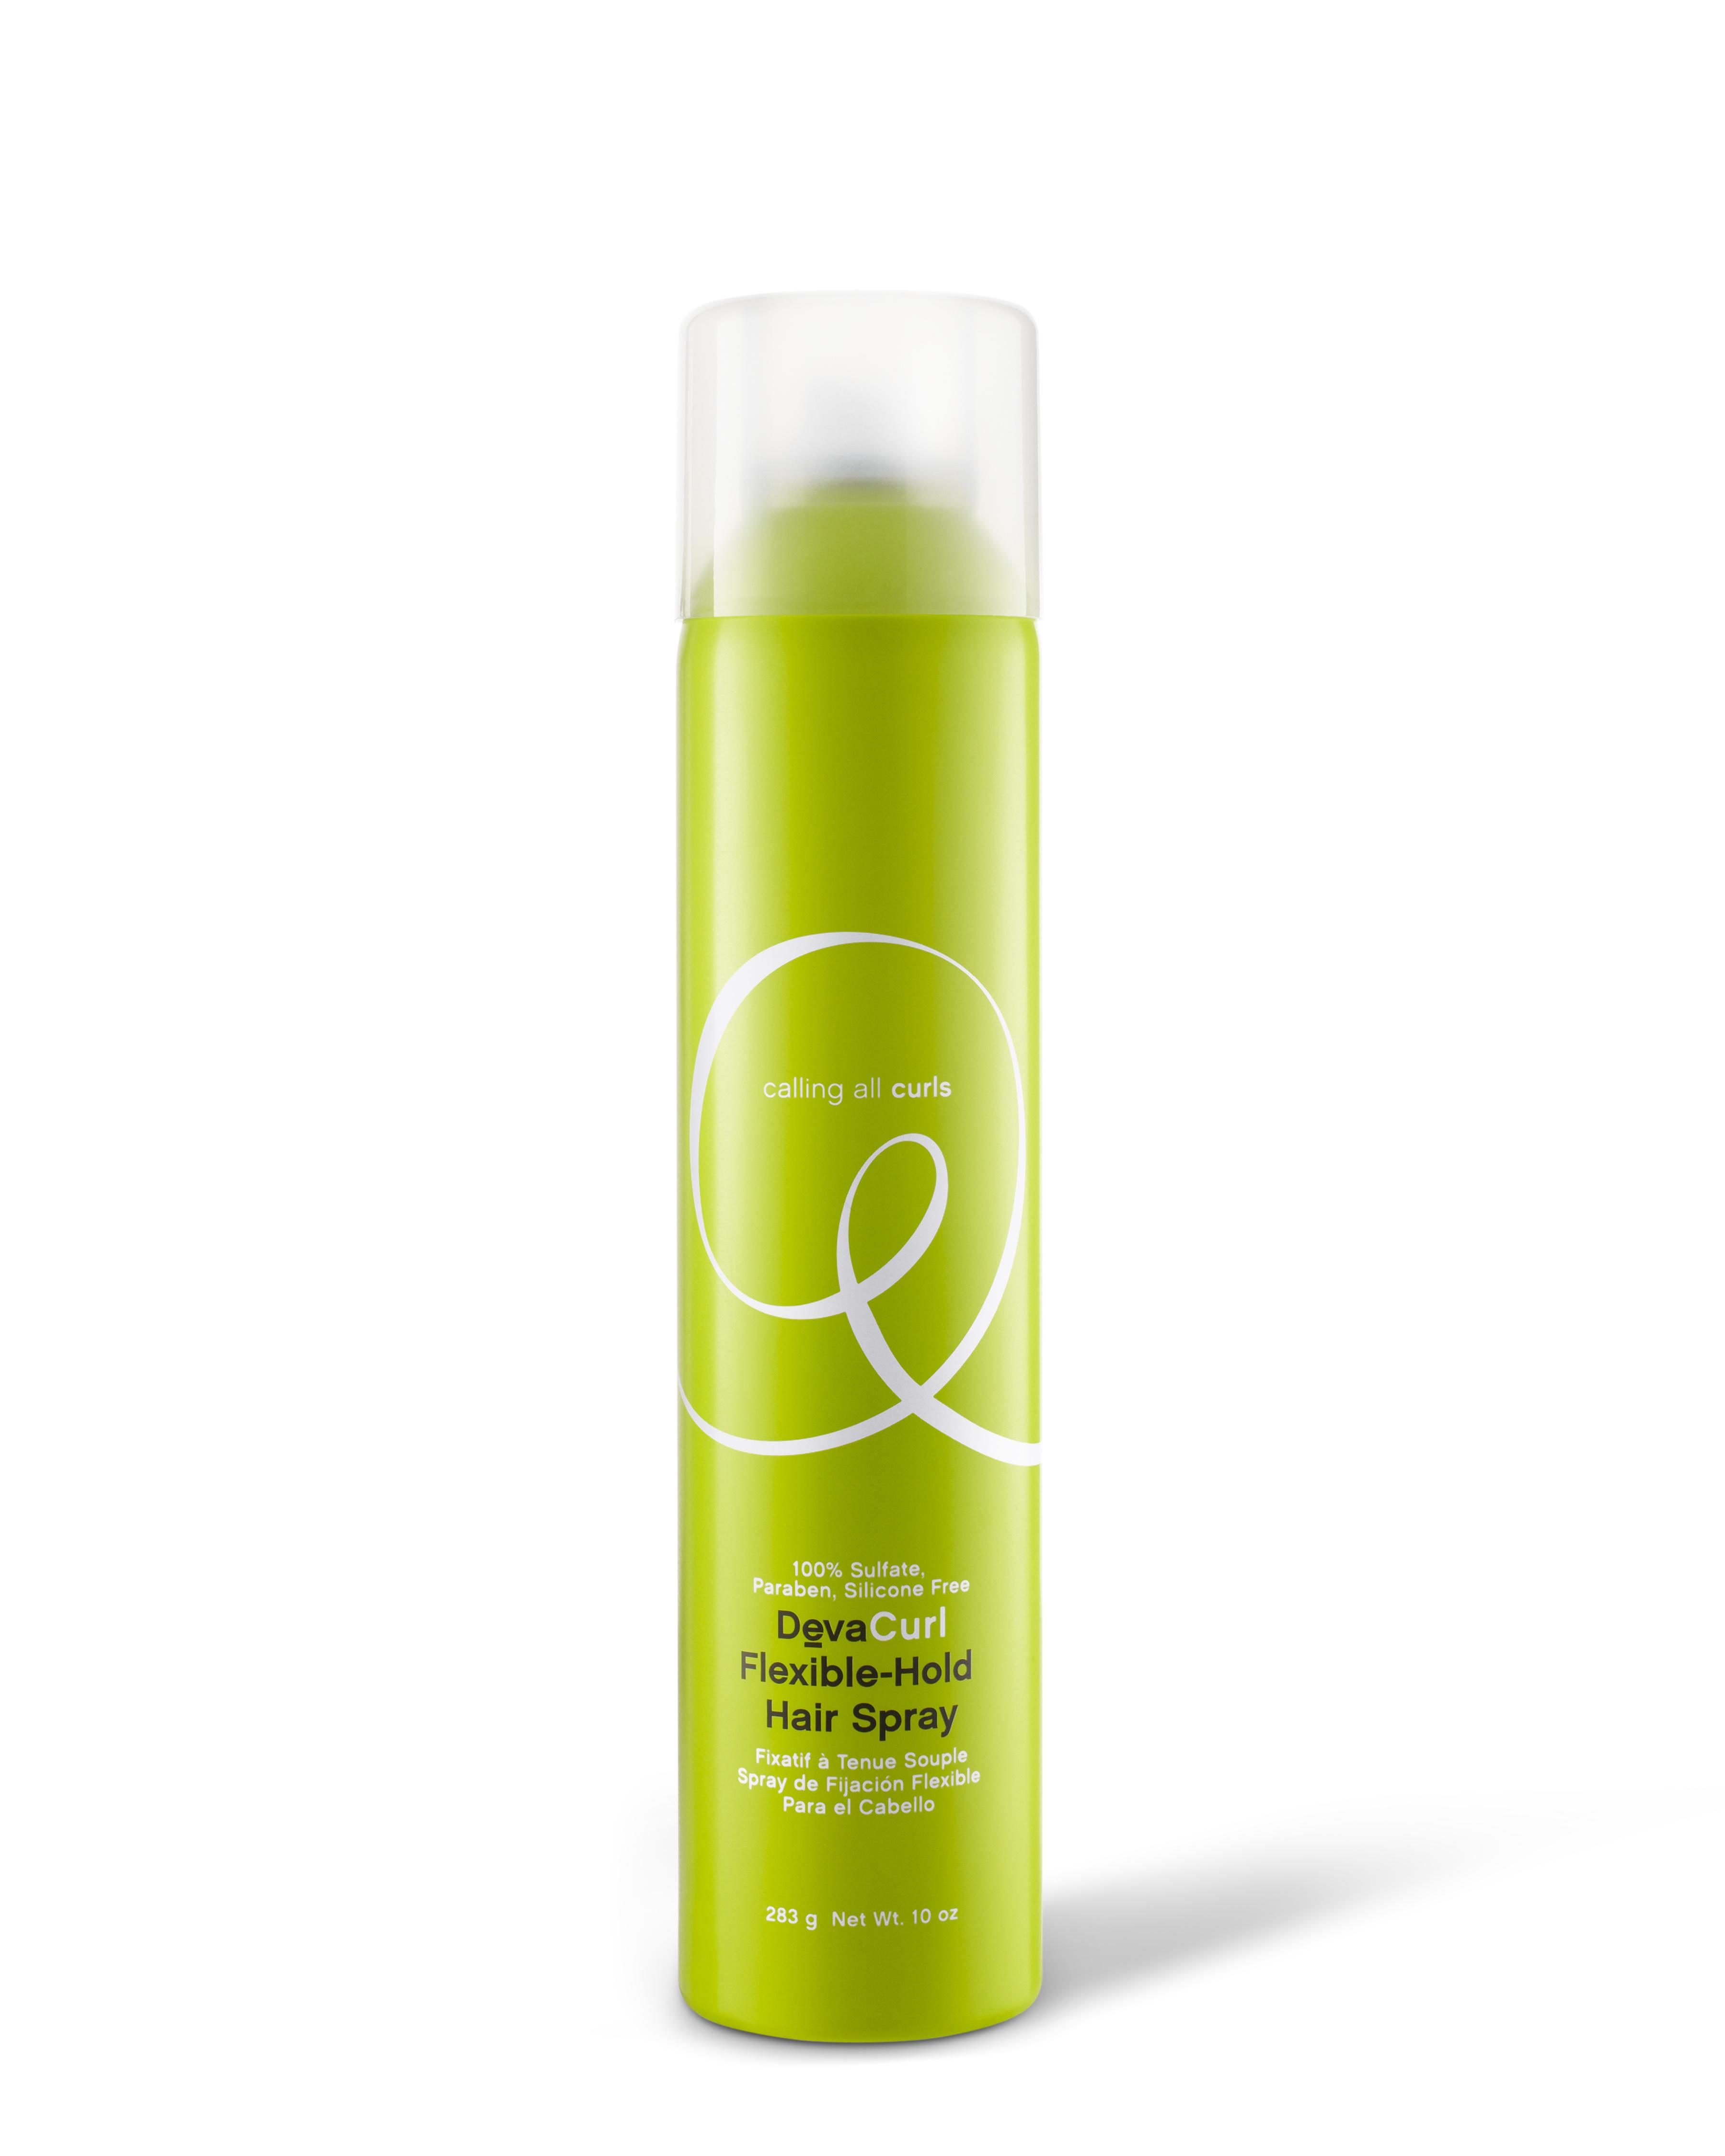 hairspray product - photo #32